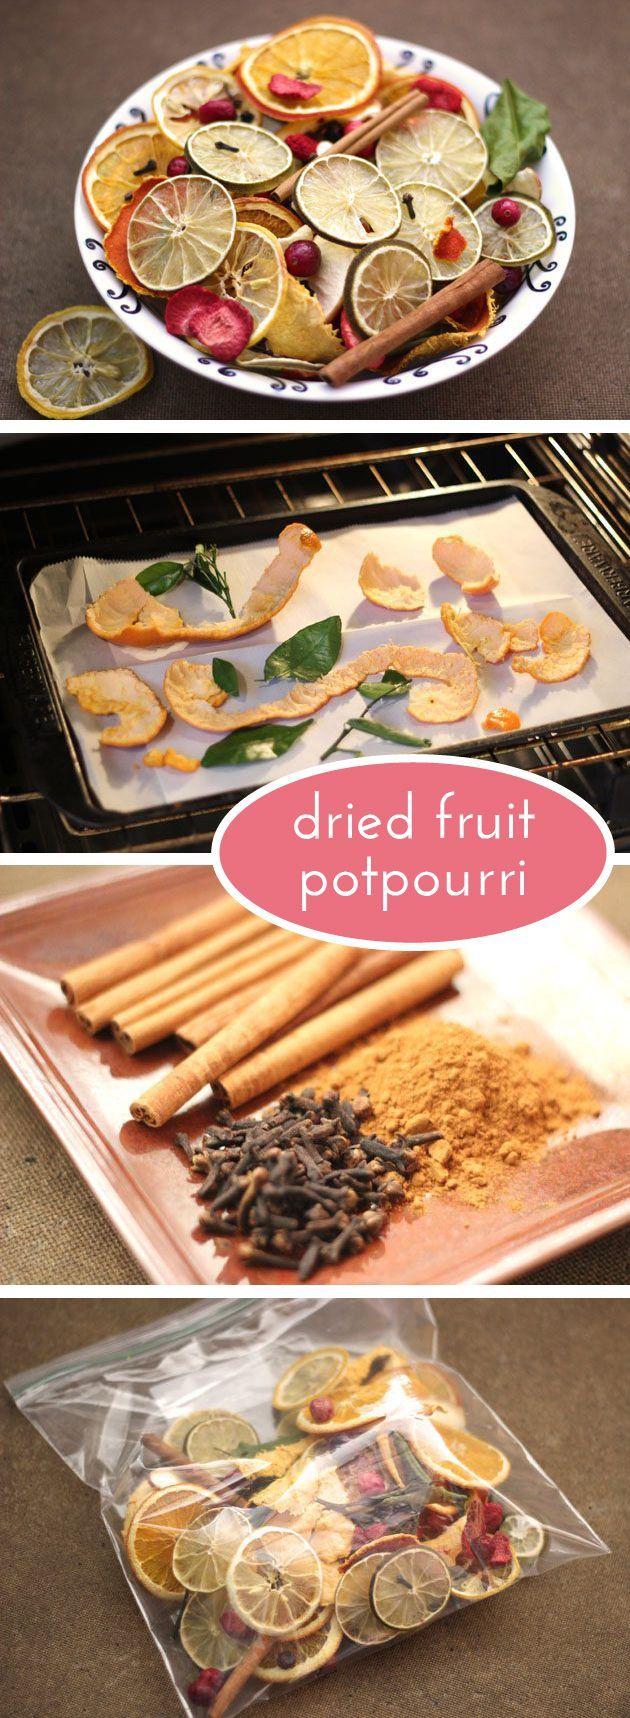 Potpourri Fai Da Te.How To Make Dried Fruit Potpourri Winter Decorations Natale Fai